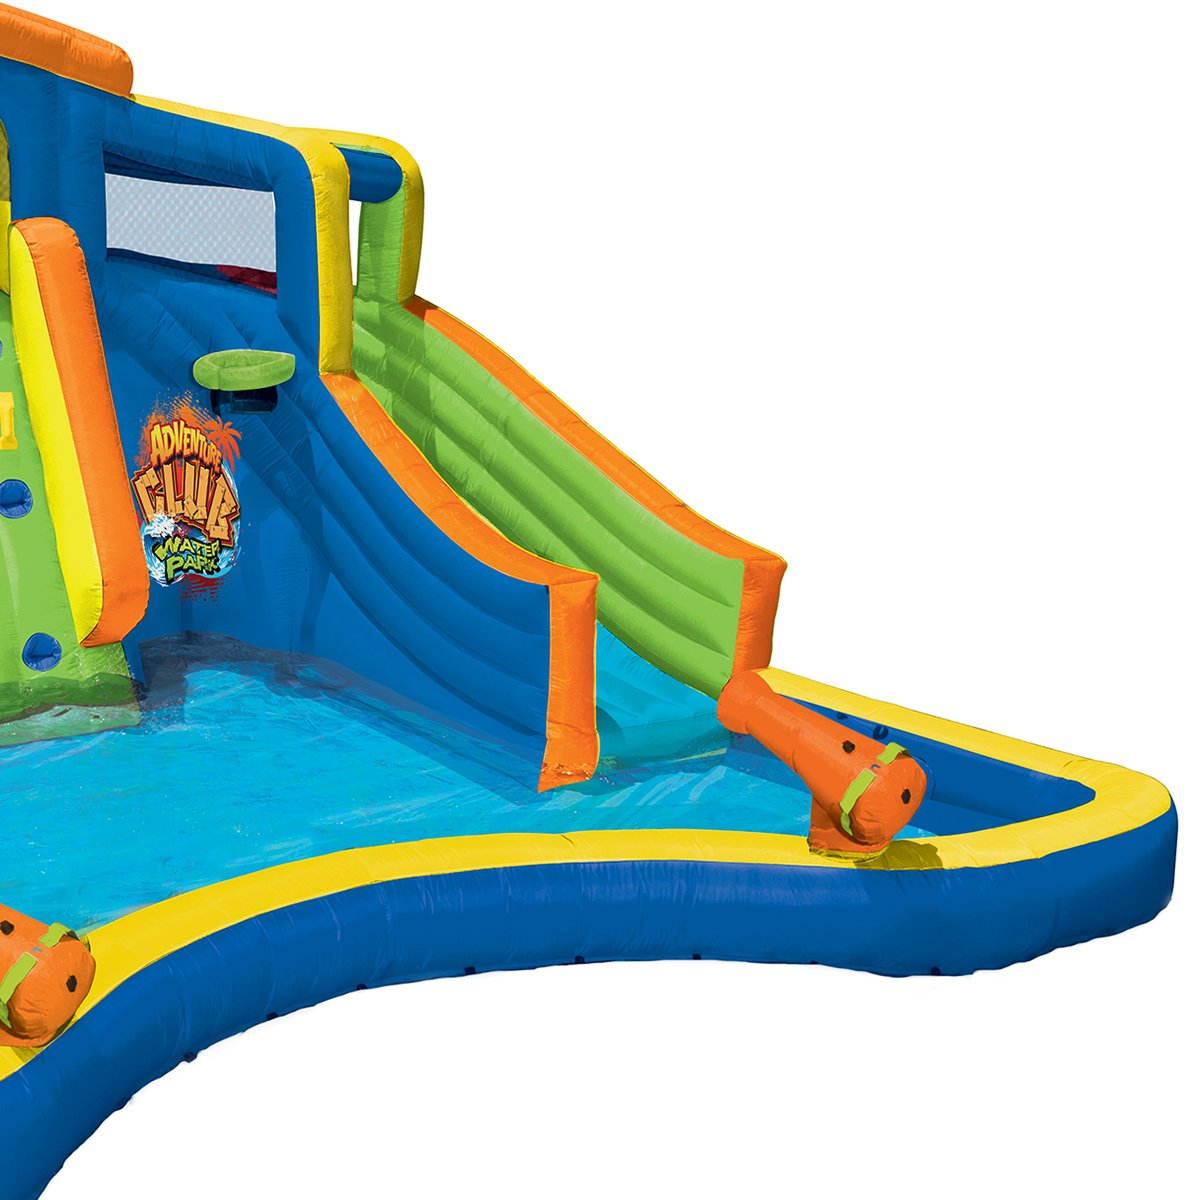 Banzai Inflatable Adventure Club Dual Slide and Pool Backyard Water Park